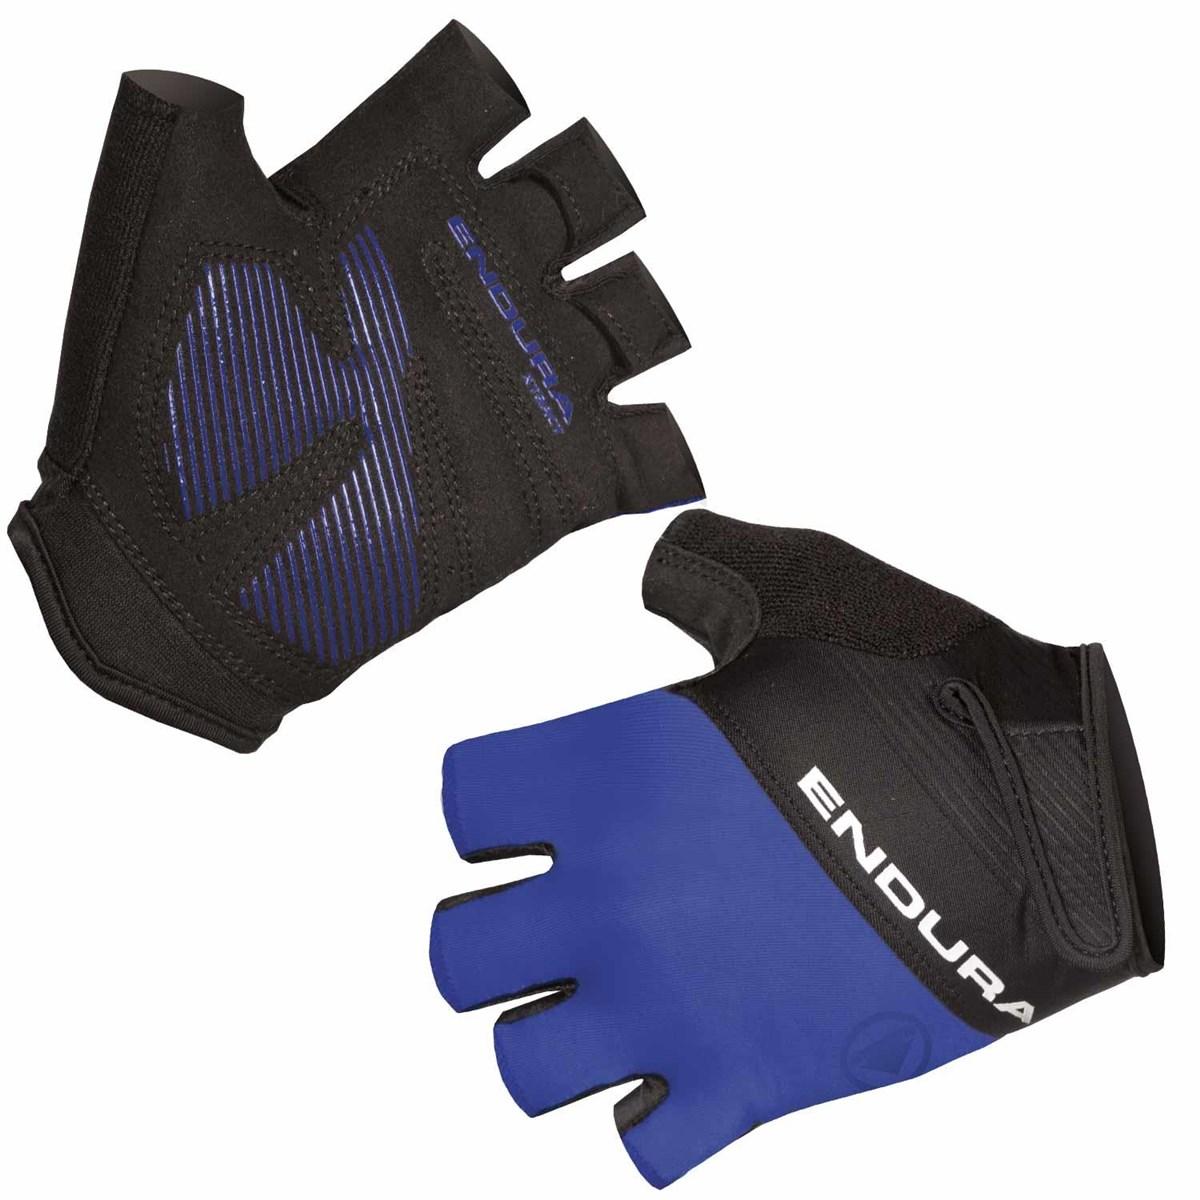 Endura Xtract Mitt II Glove - black | Gloves